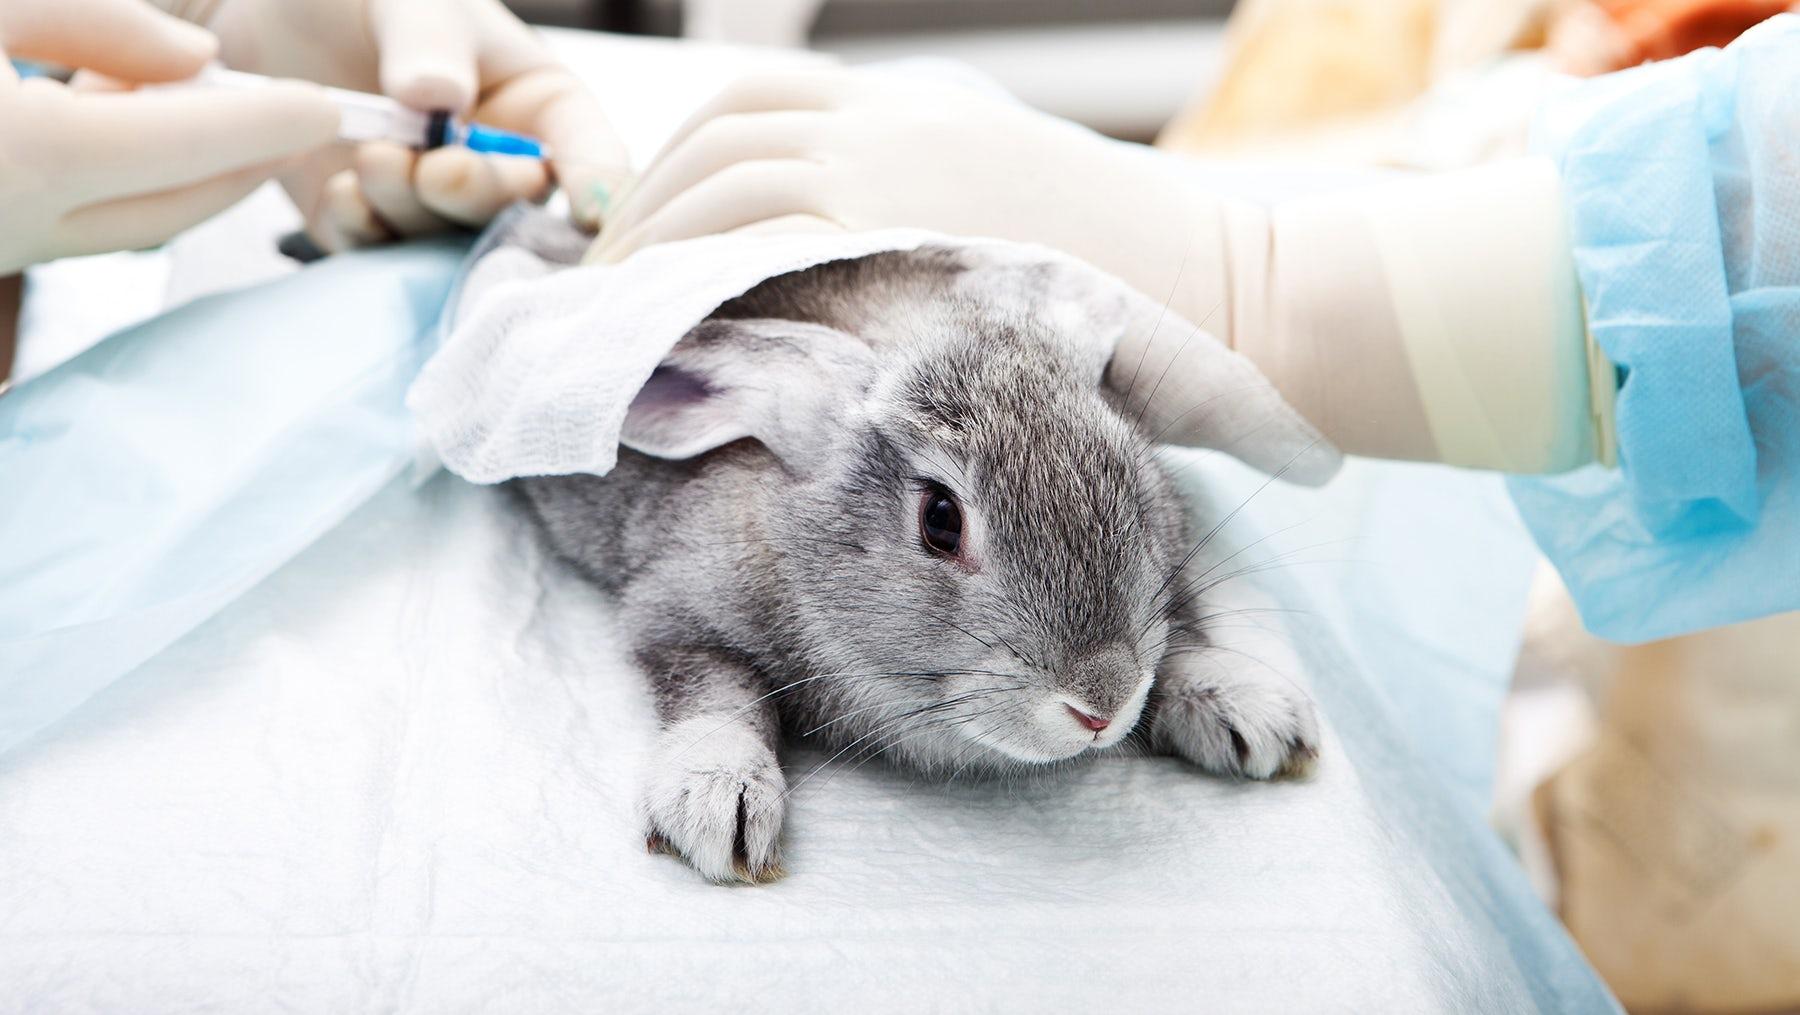 Cosmetics animal testing | Source: Shutterstock